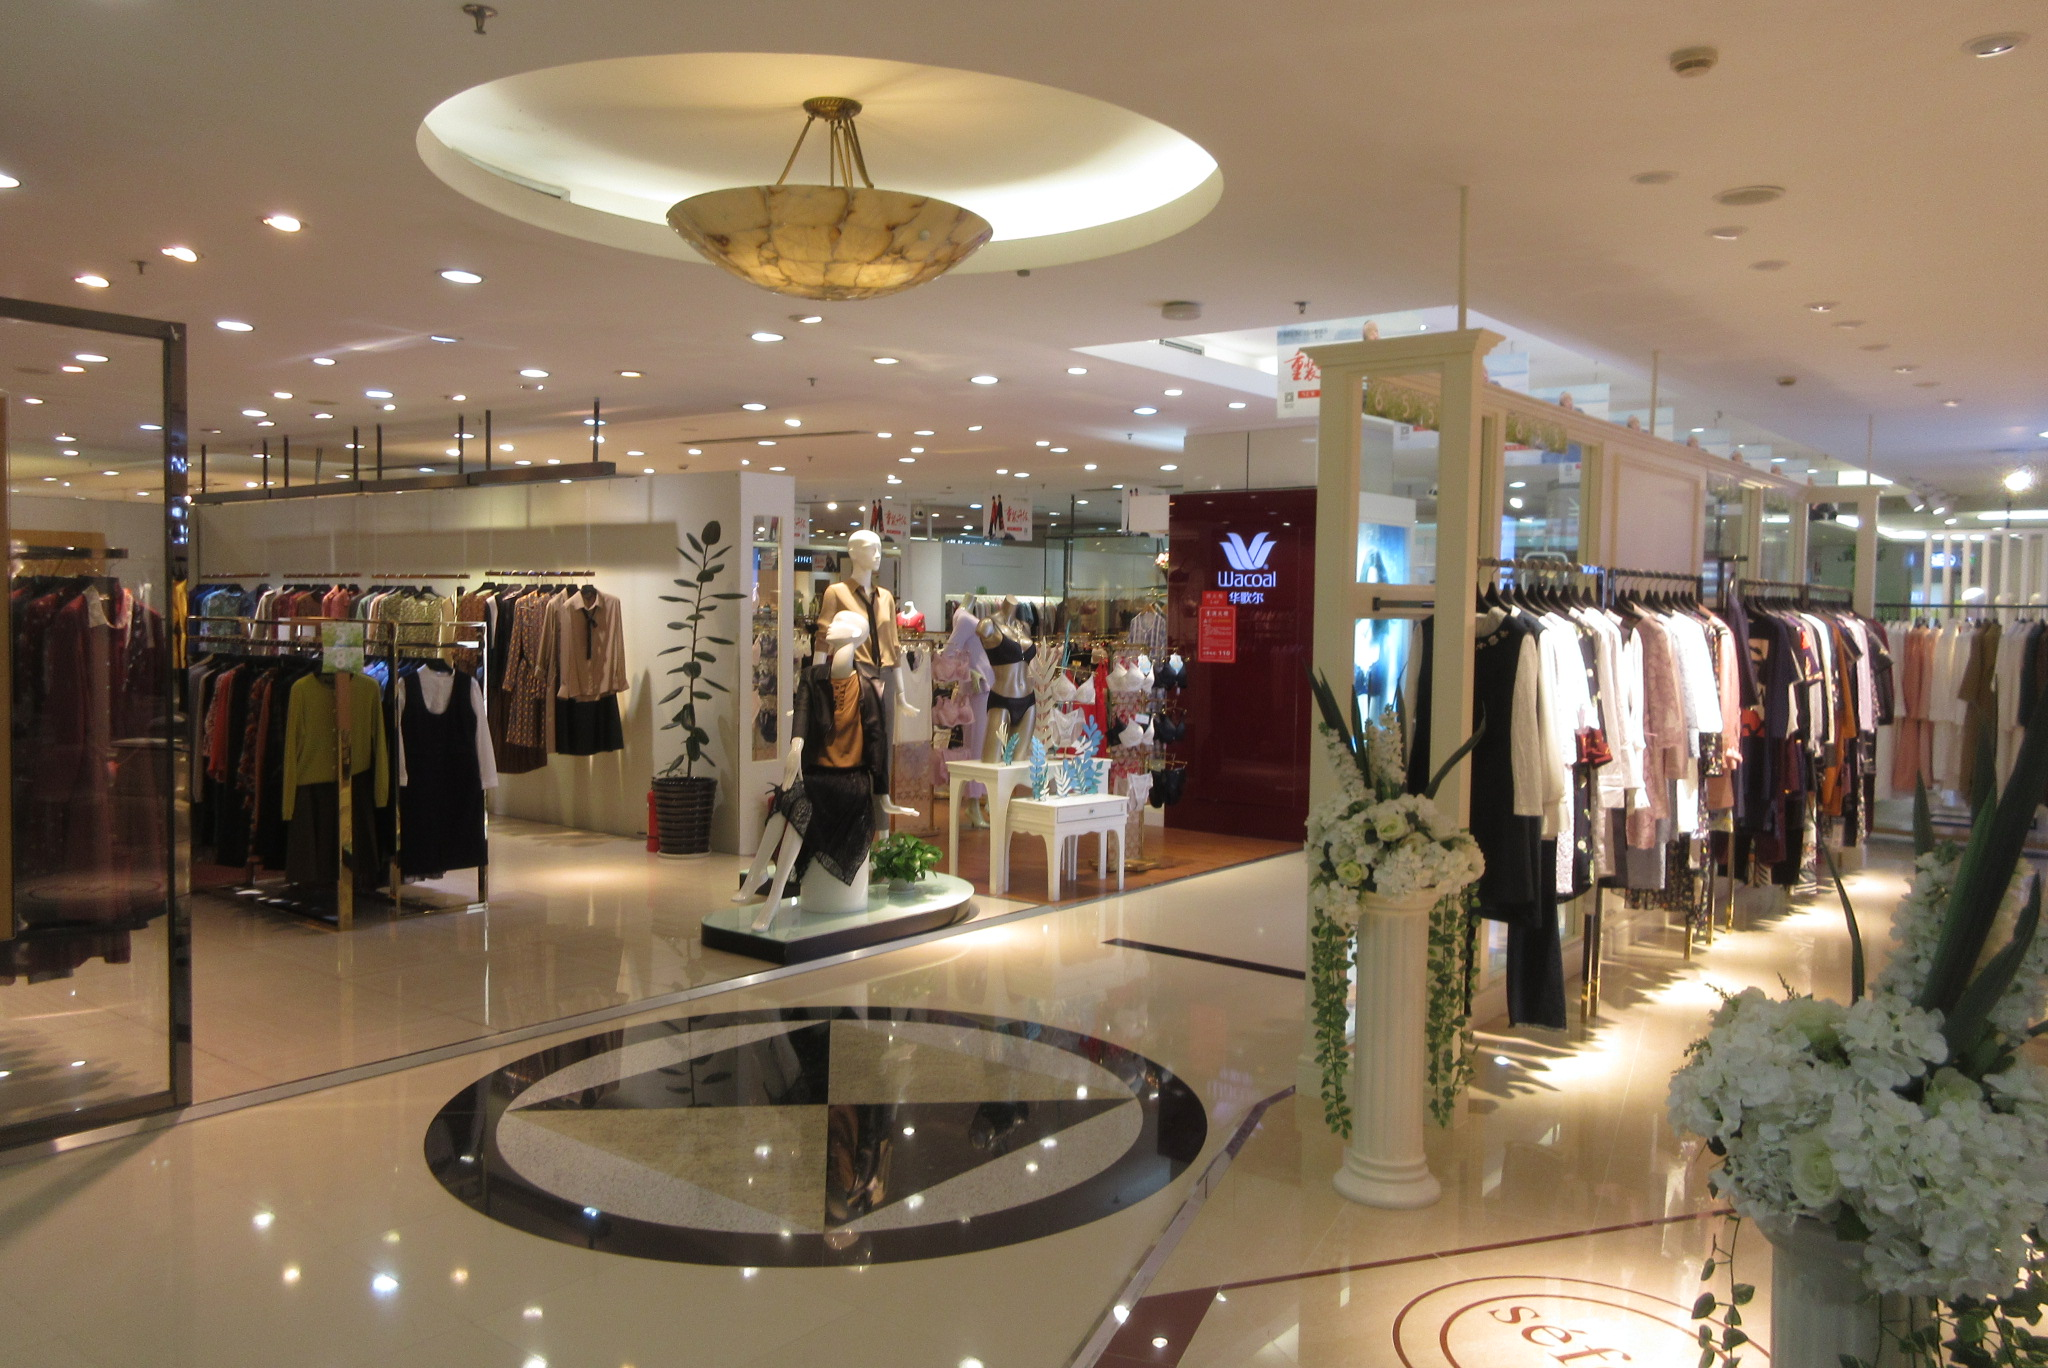 1c0376e5a File SZ 深圳 Shenzhen 蛇口 Shekou 花園城市中心 Garden City Center mall clothing shops  Sept 2017 IX1.jpg